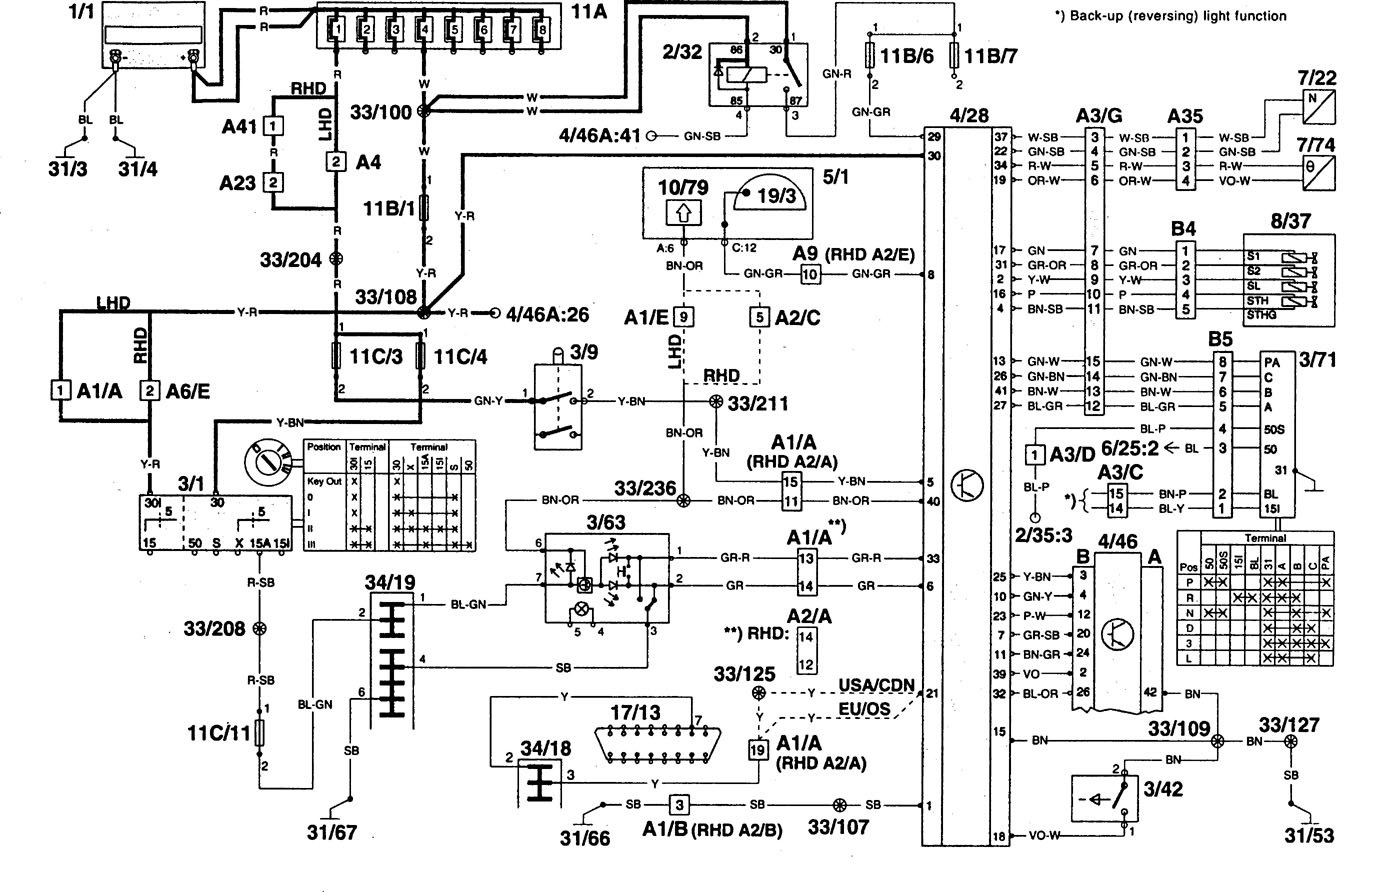 4 3 diagram, volvo penta 3 0 gl wiring diagram - auto electrical wiring  diagram on volvo penta parts